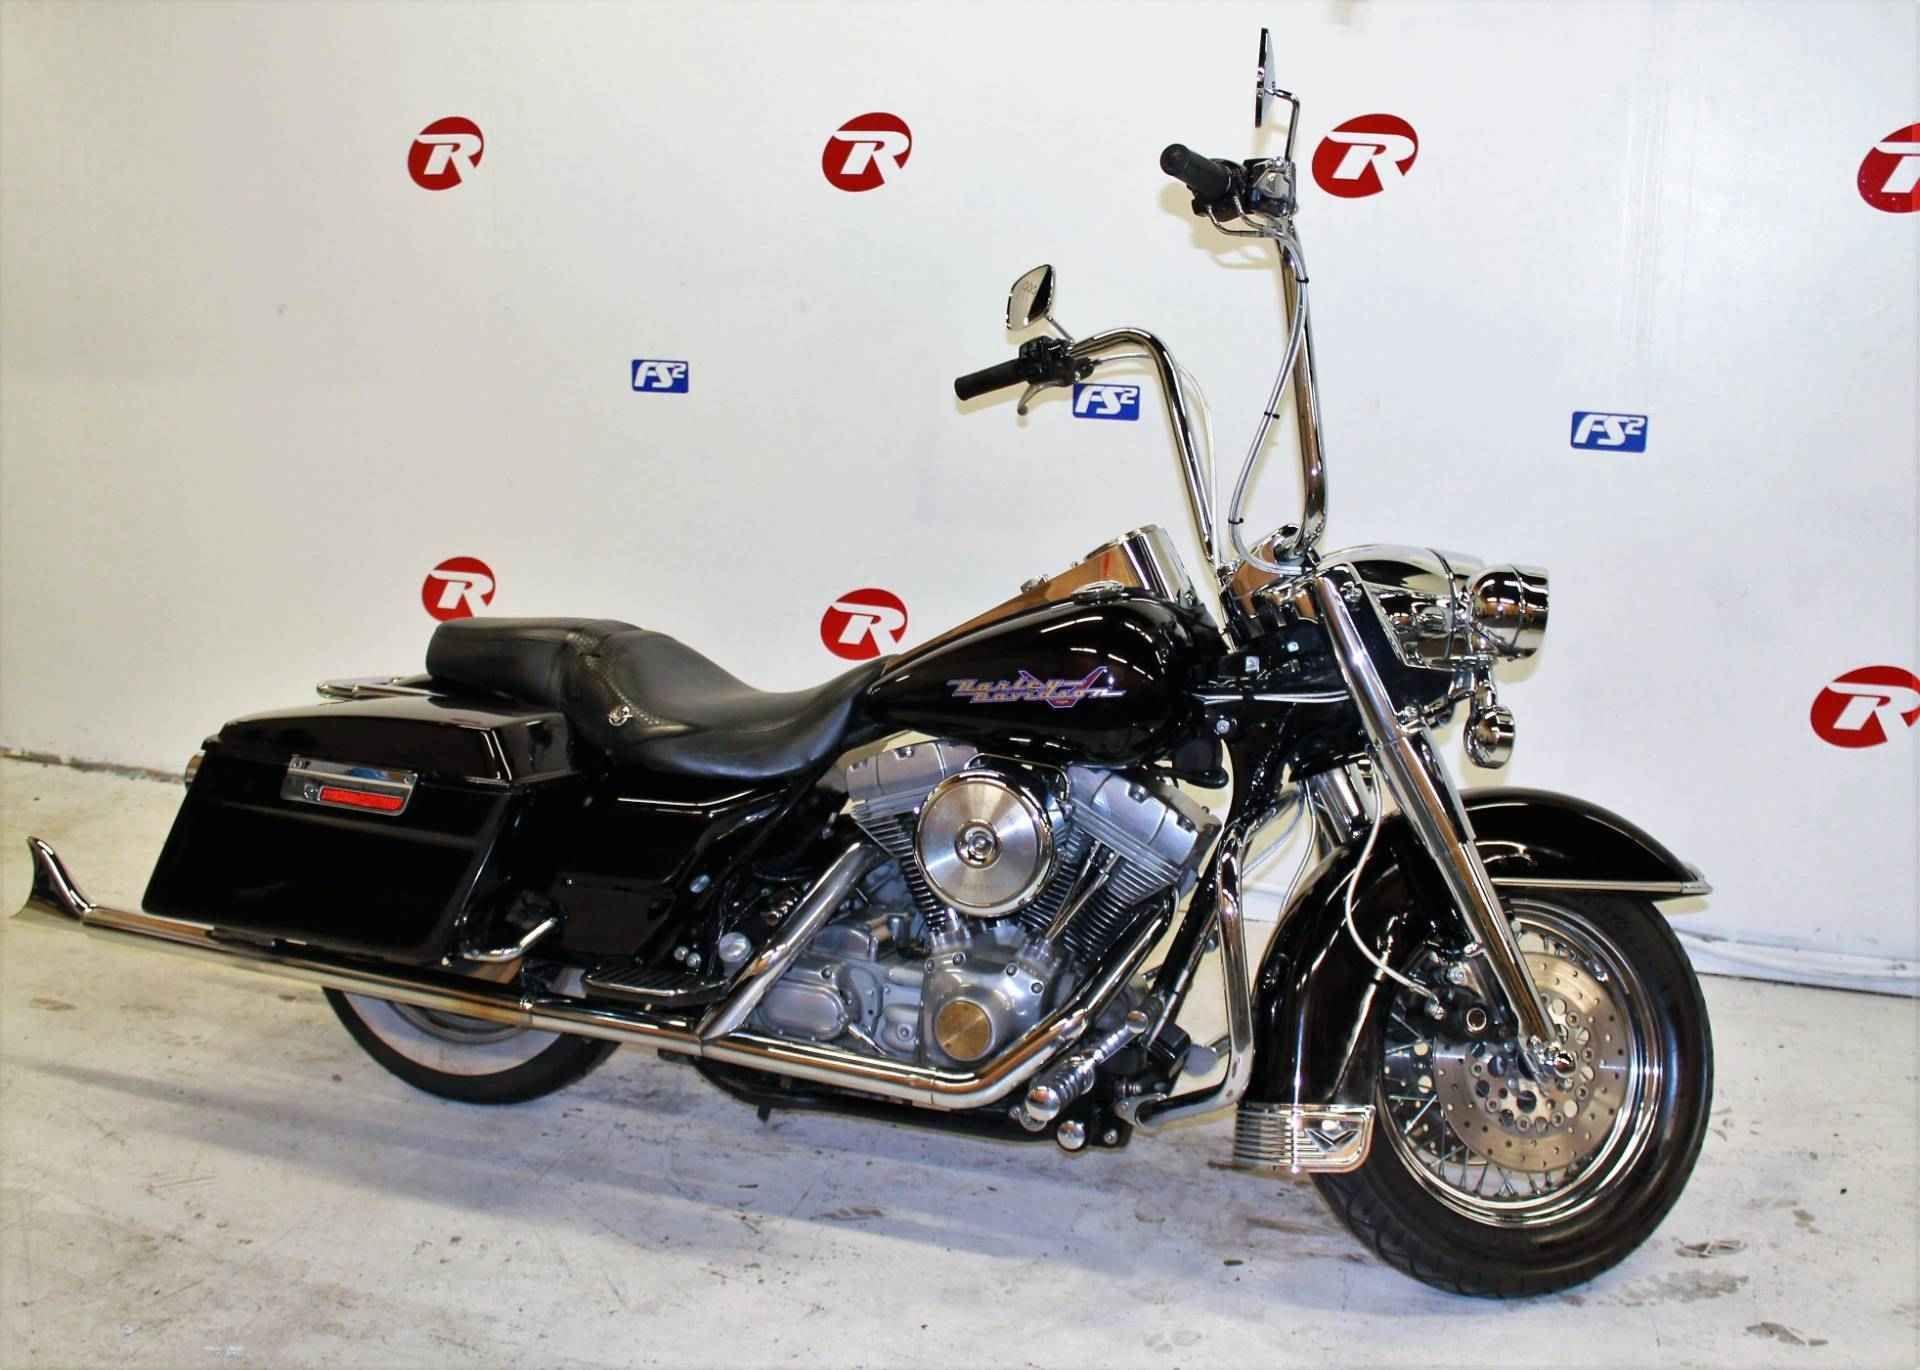 1999 Harley Davidson Flht Electra Glidea Standard Harley Davidson Harley Davidson Buell Softail Bobber [ 1370 x 1920 Pixel ]